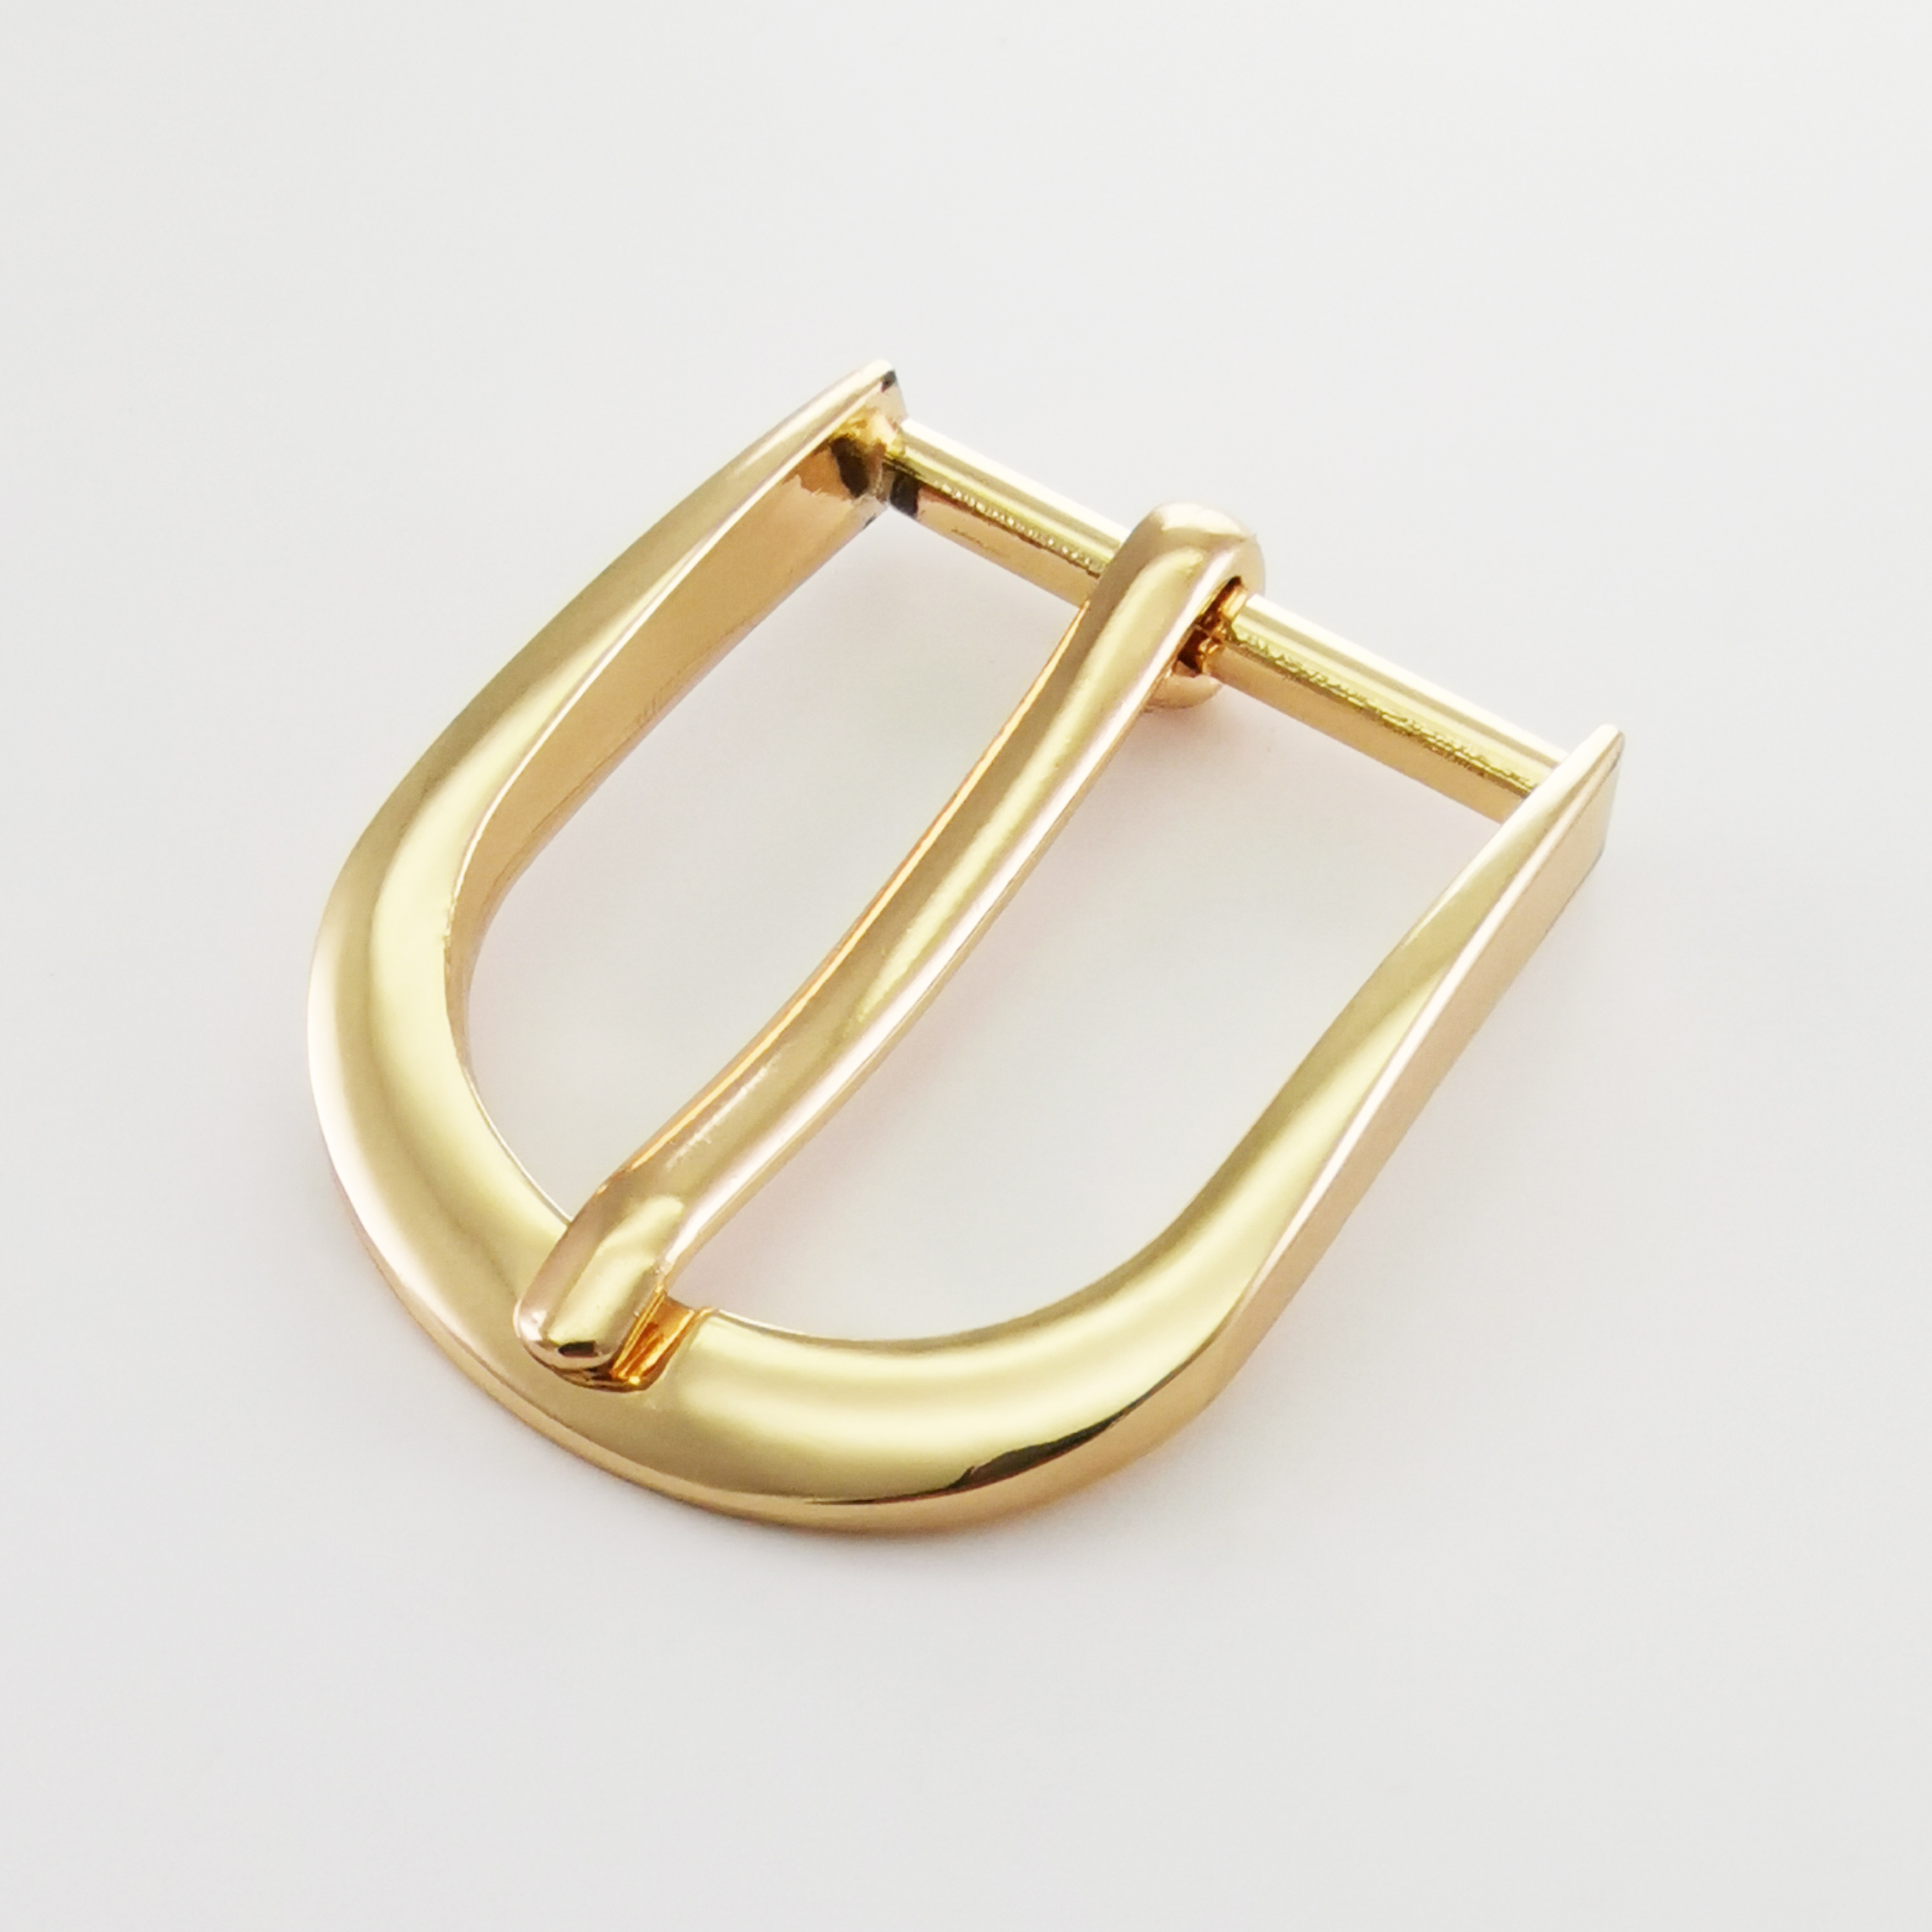 Top Quality New Design Zinc Pin Buckle for Women  Belt